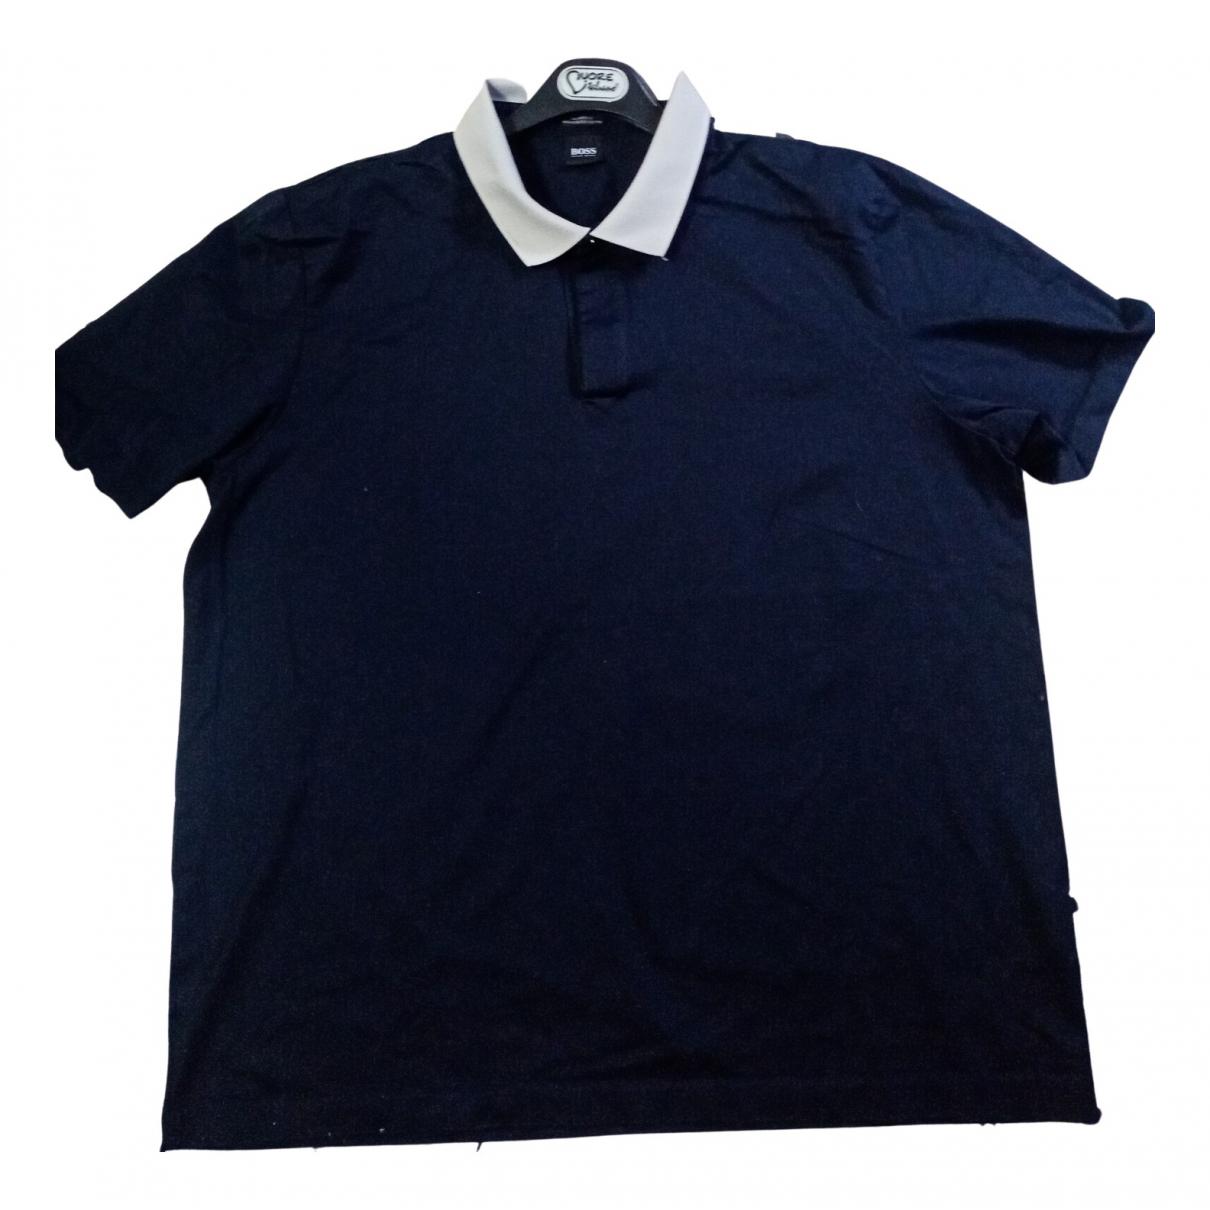 Boss N Blue Cotton Polo shirts for Men XXL International